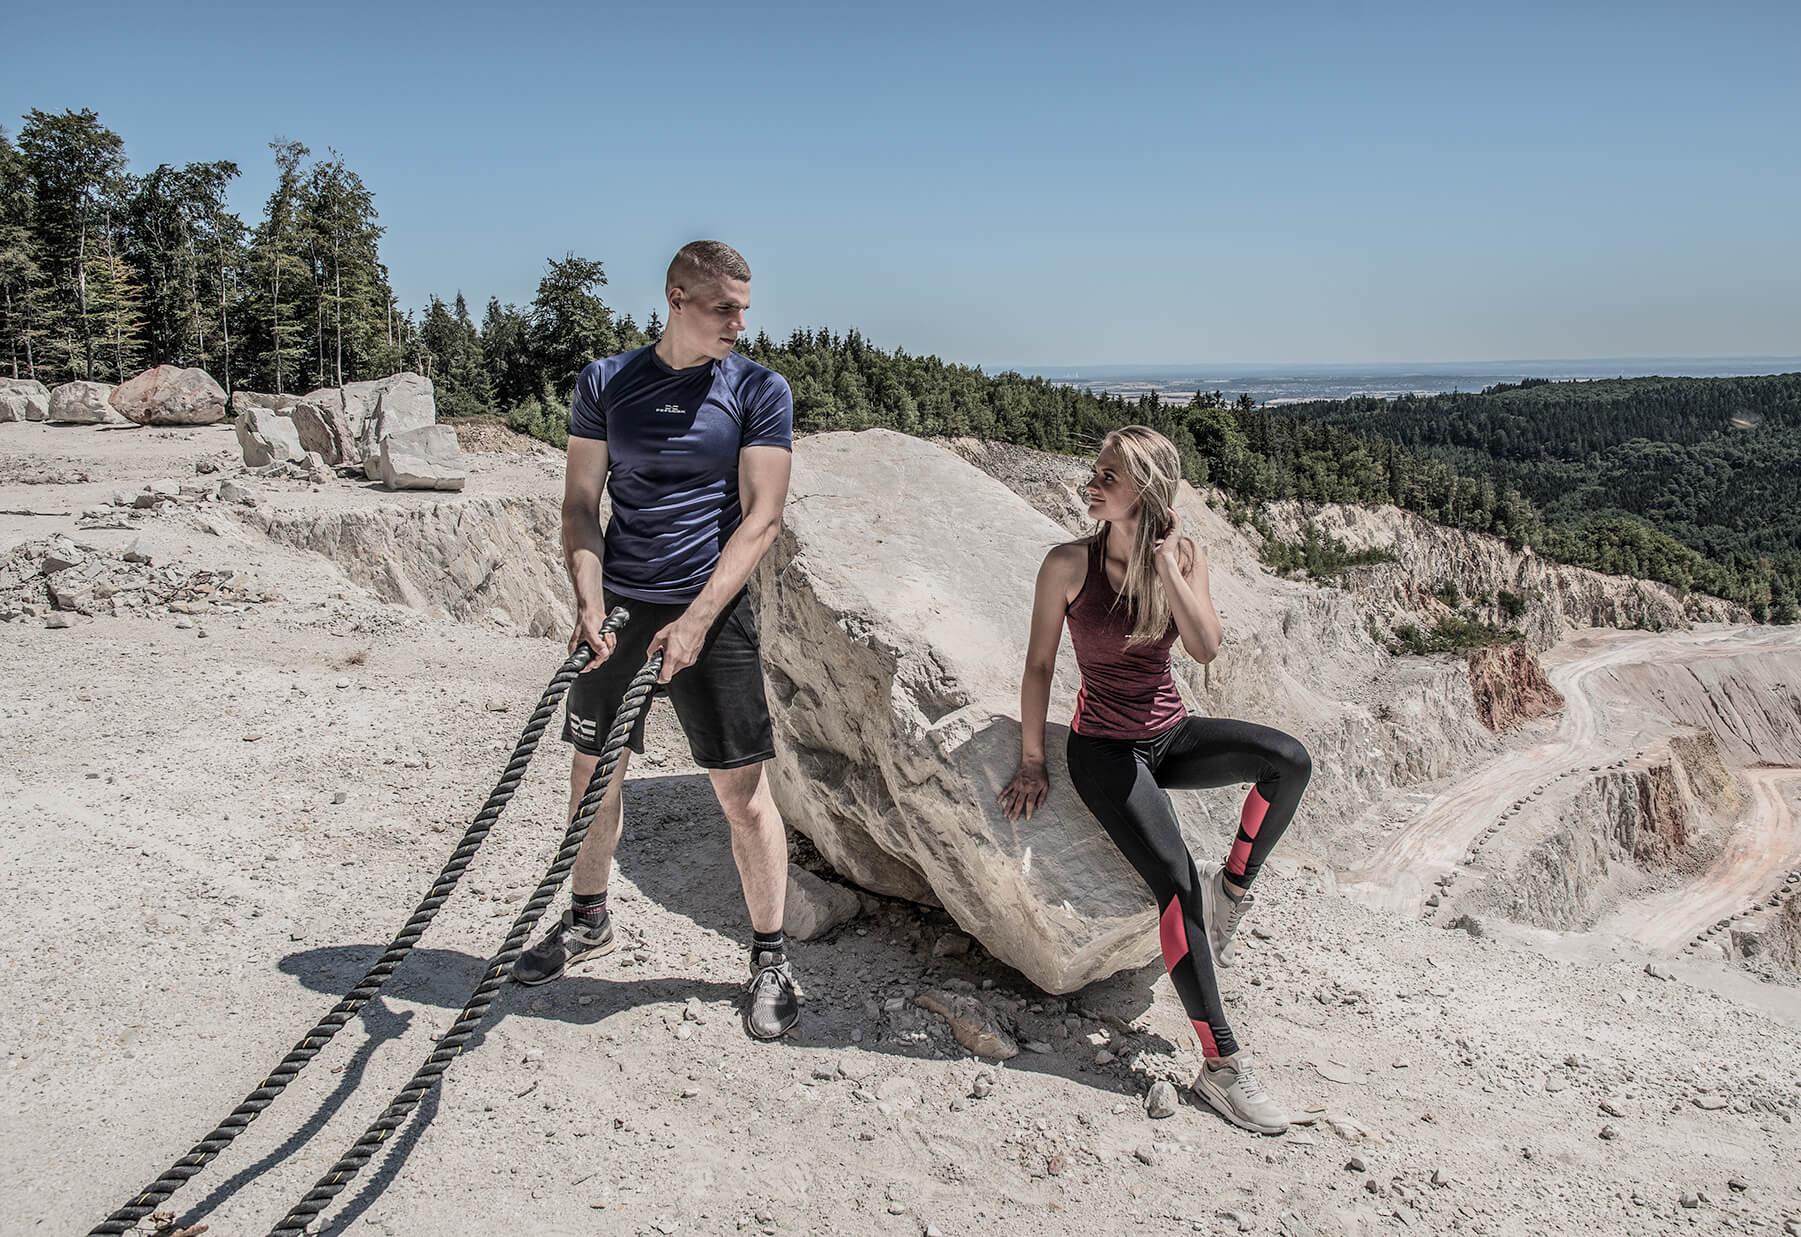 FEFLOGX Sportswear, Shooting mit der neuen Pure-Motion Kollektion, Couple-Workout.